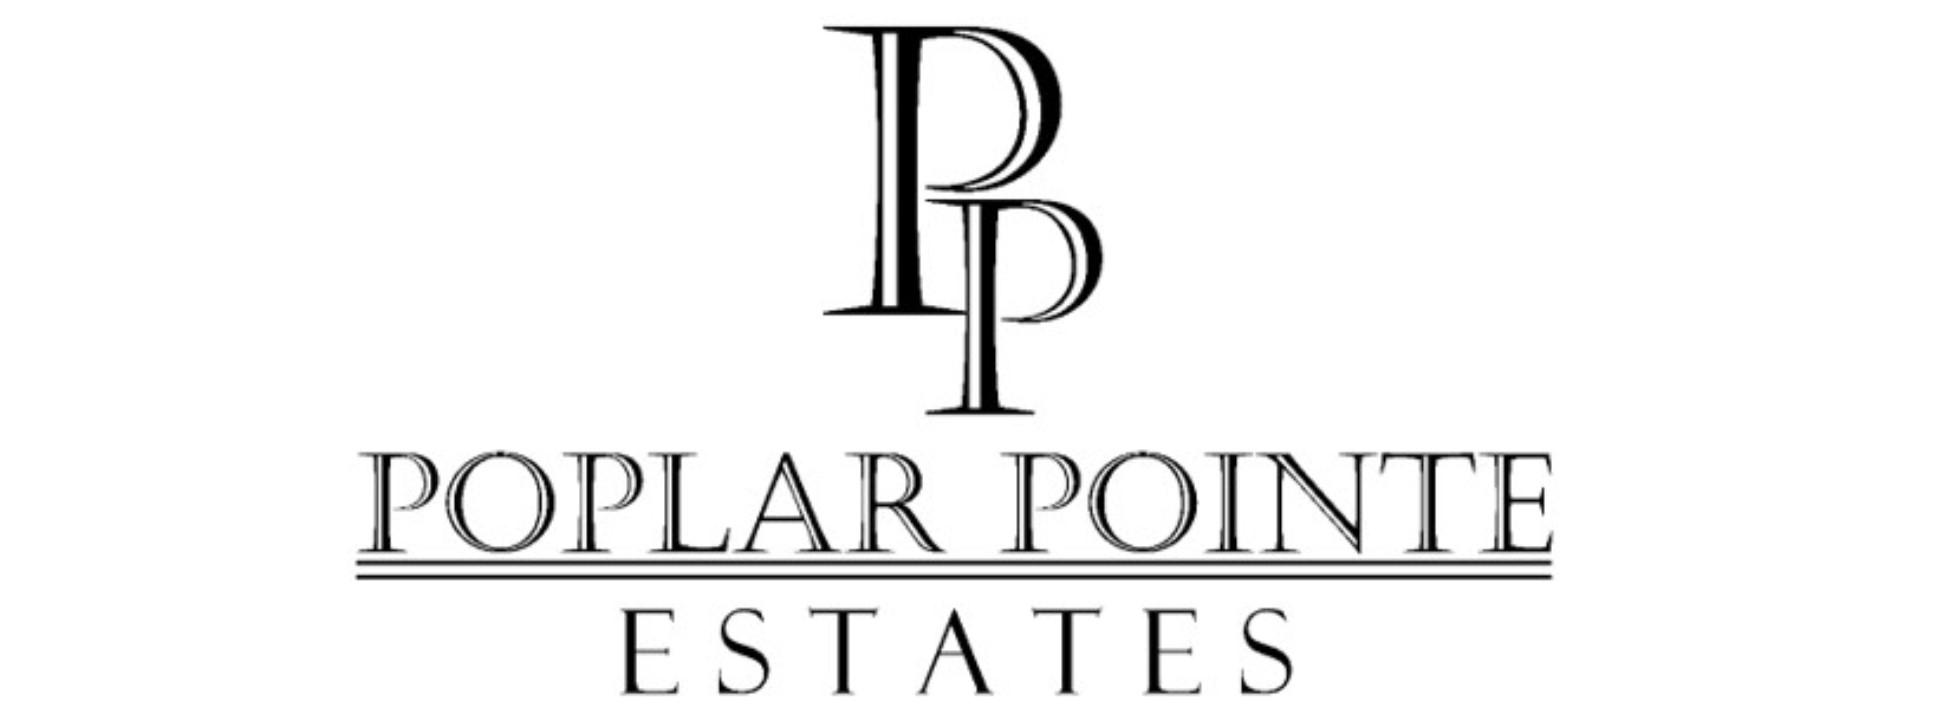 SS-Poplar Pointe